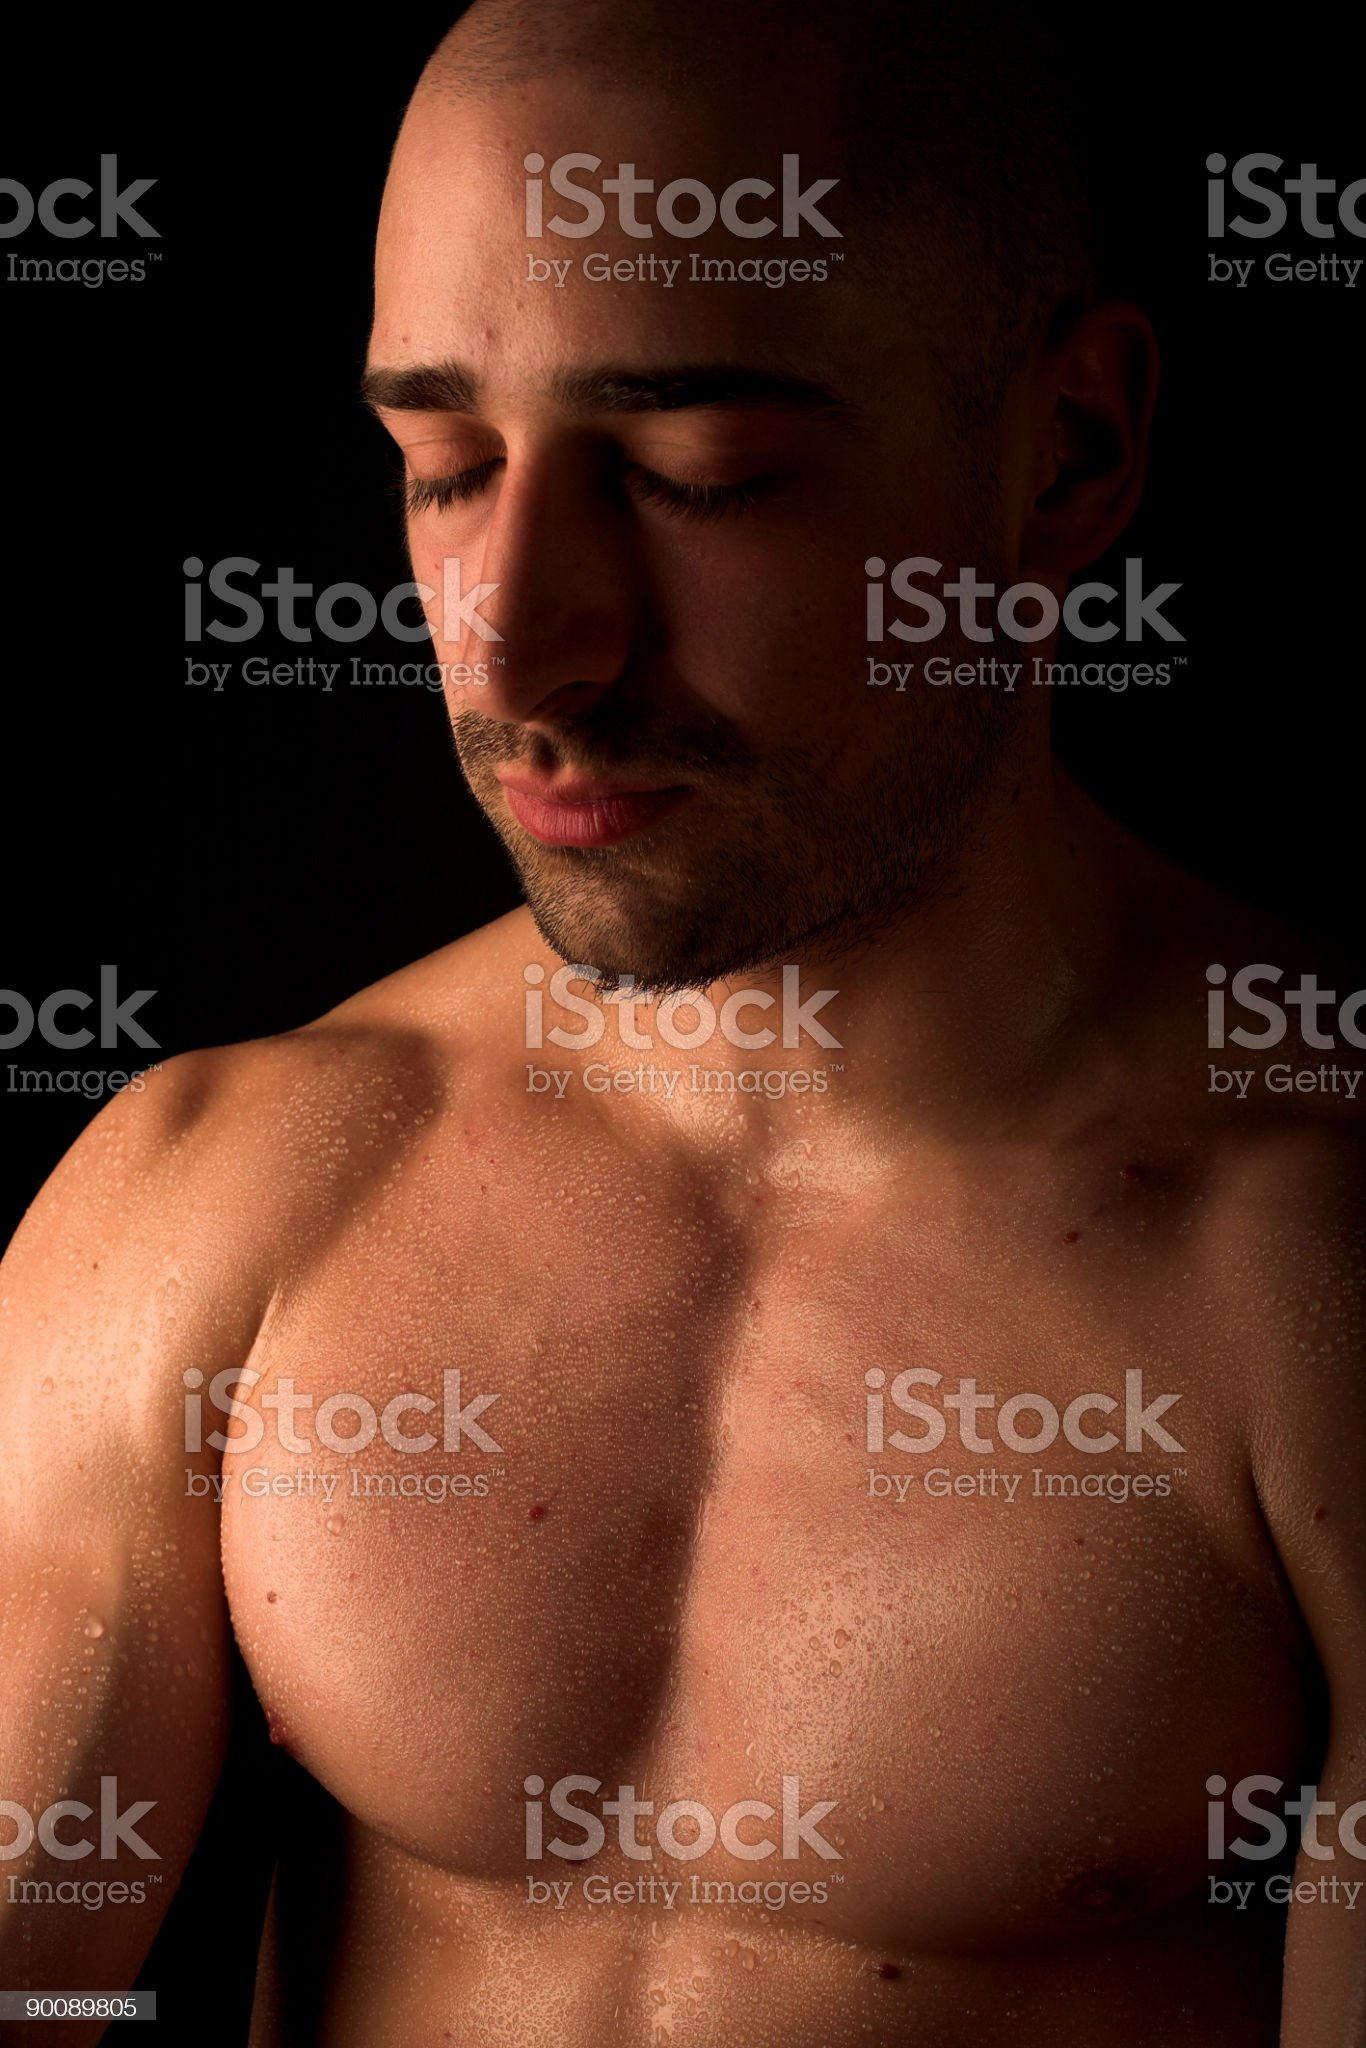 Body builder royalty-free stock photo